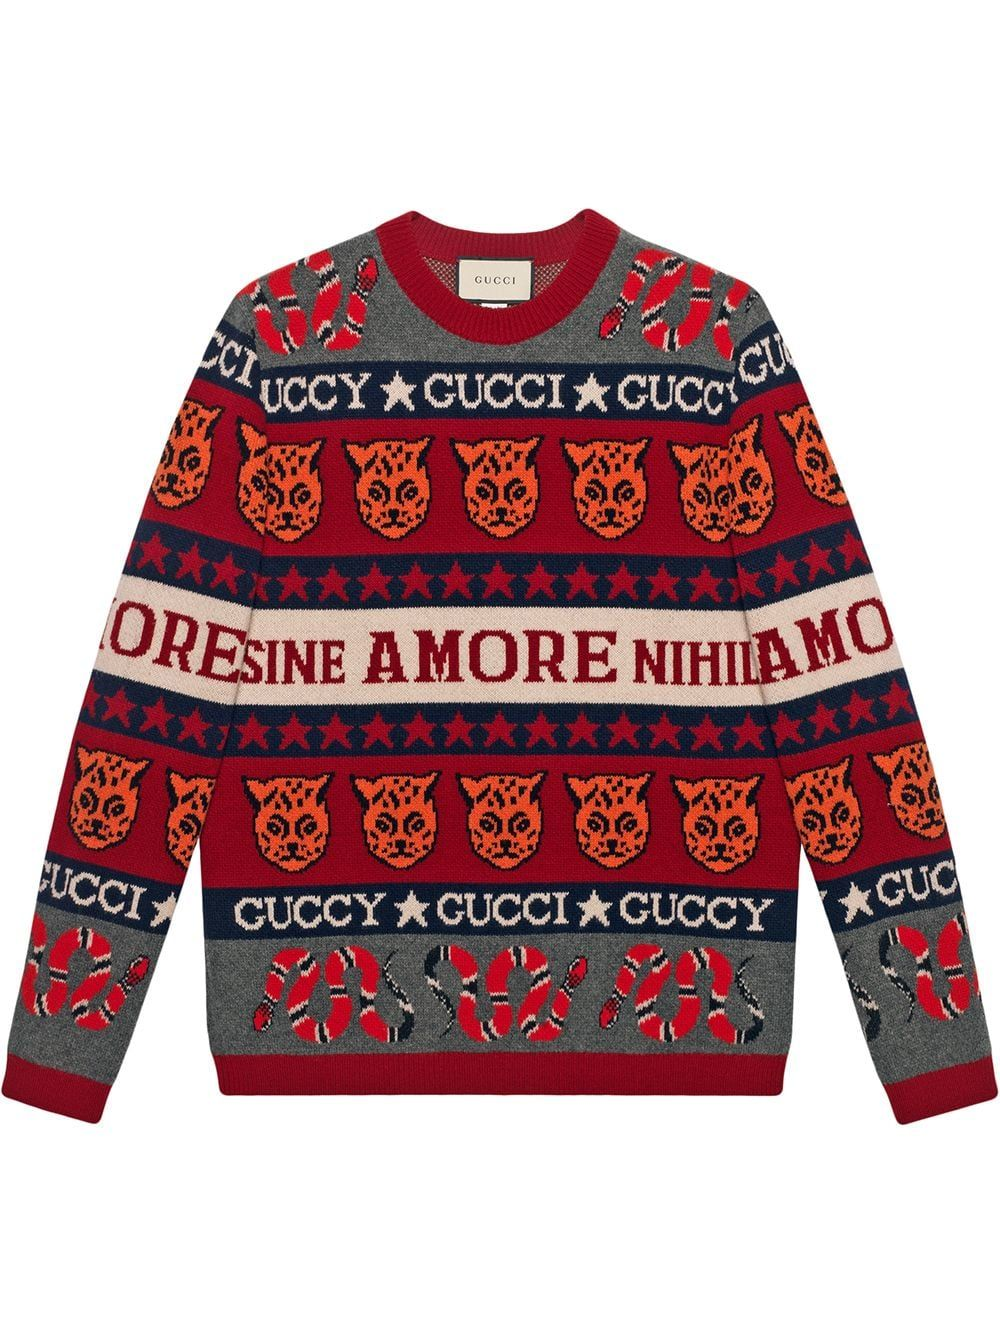 9f9375647 GUCCI GUCCI SYMBOL JACQUARD JUMPER - RED. #gucci #cloth | Gucci ...